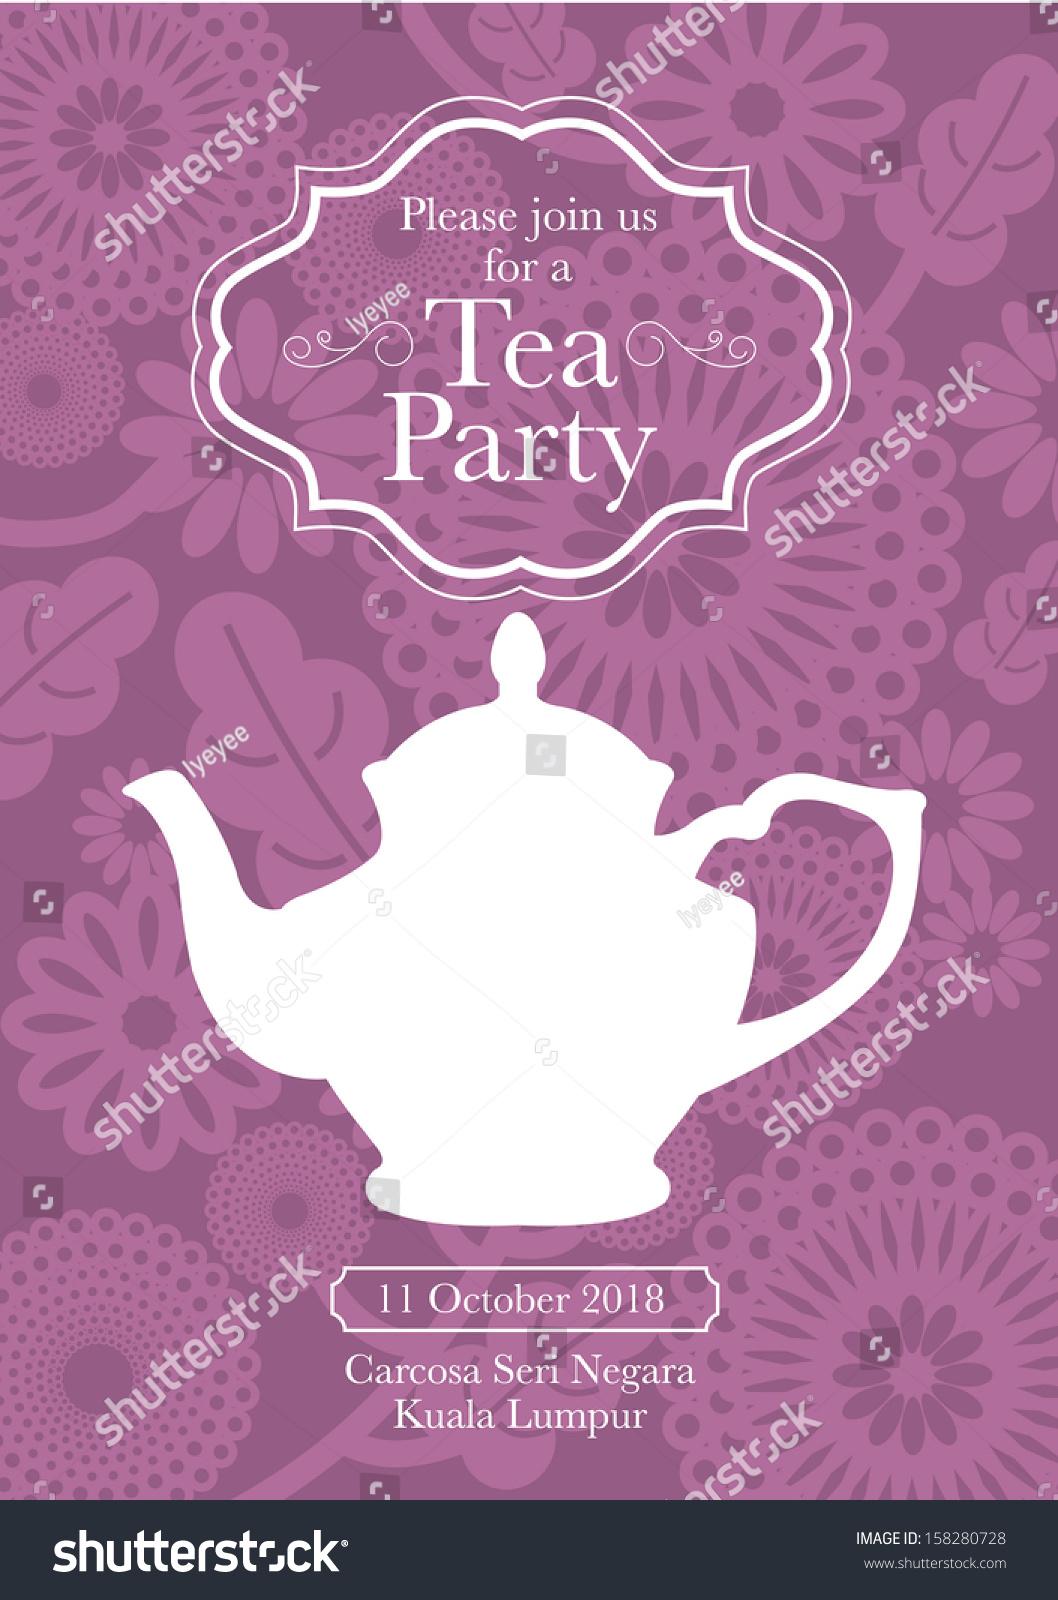 tea party invitation card template vectorillustration